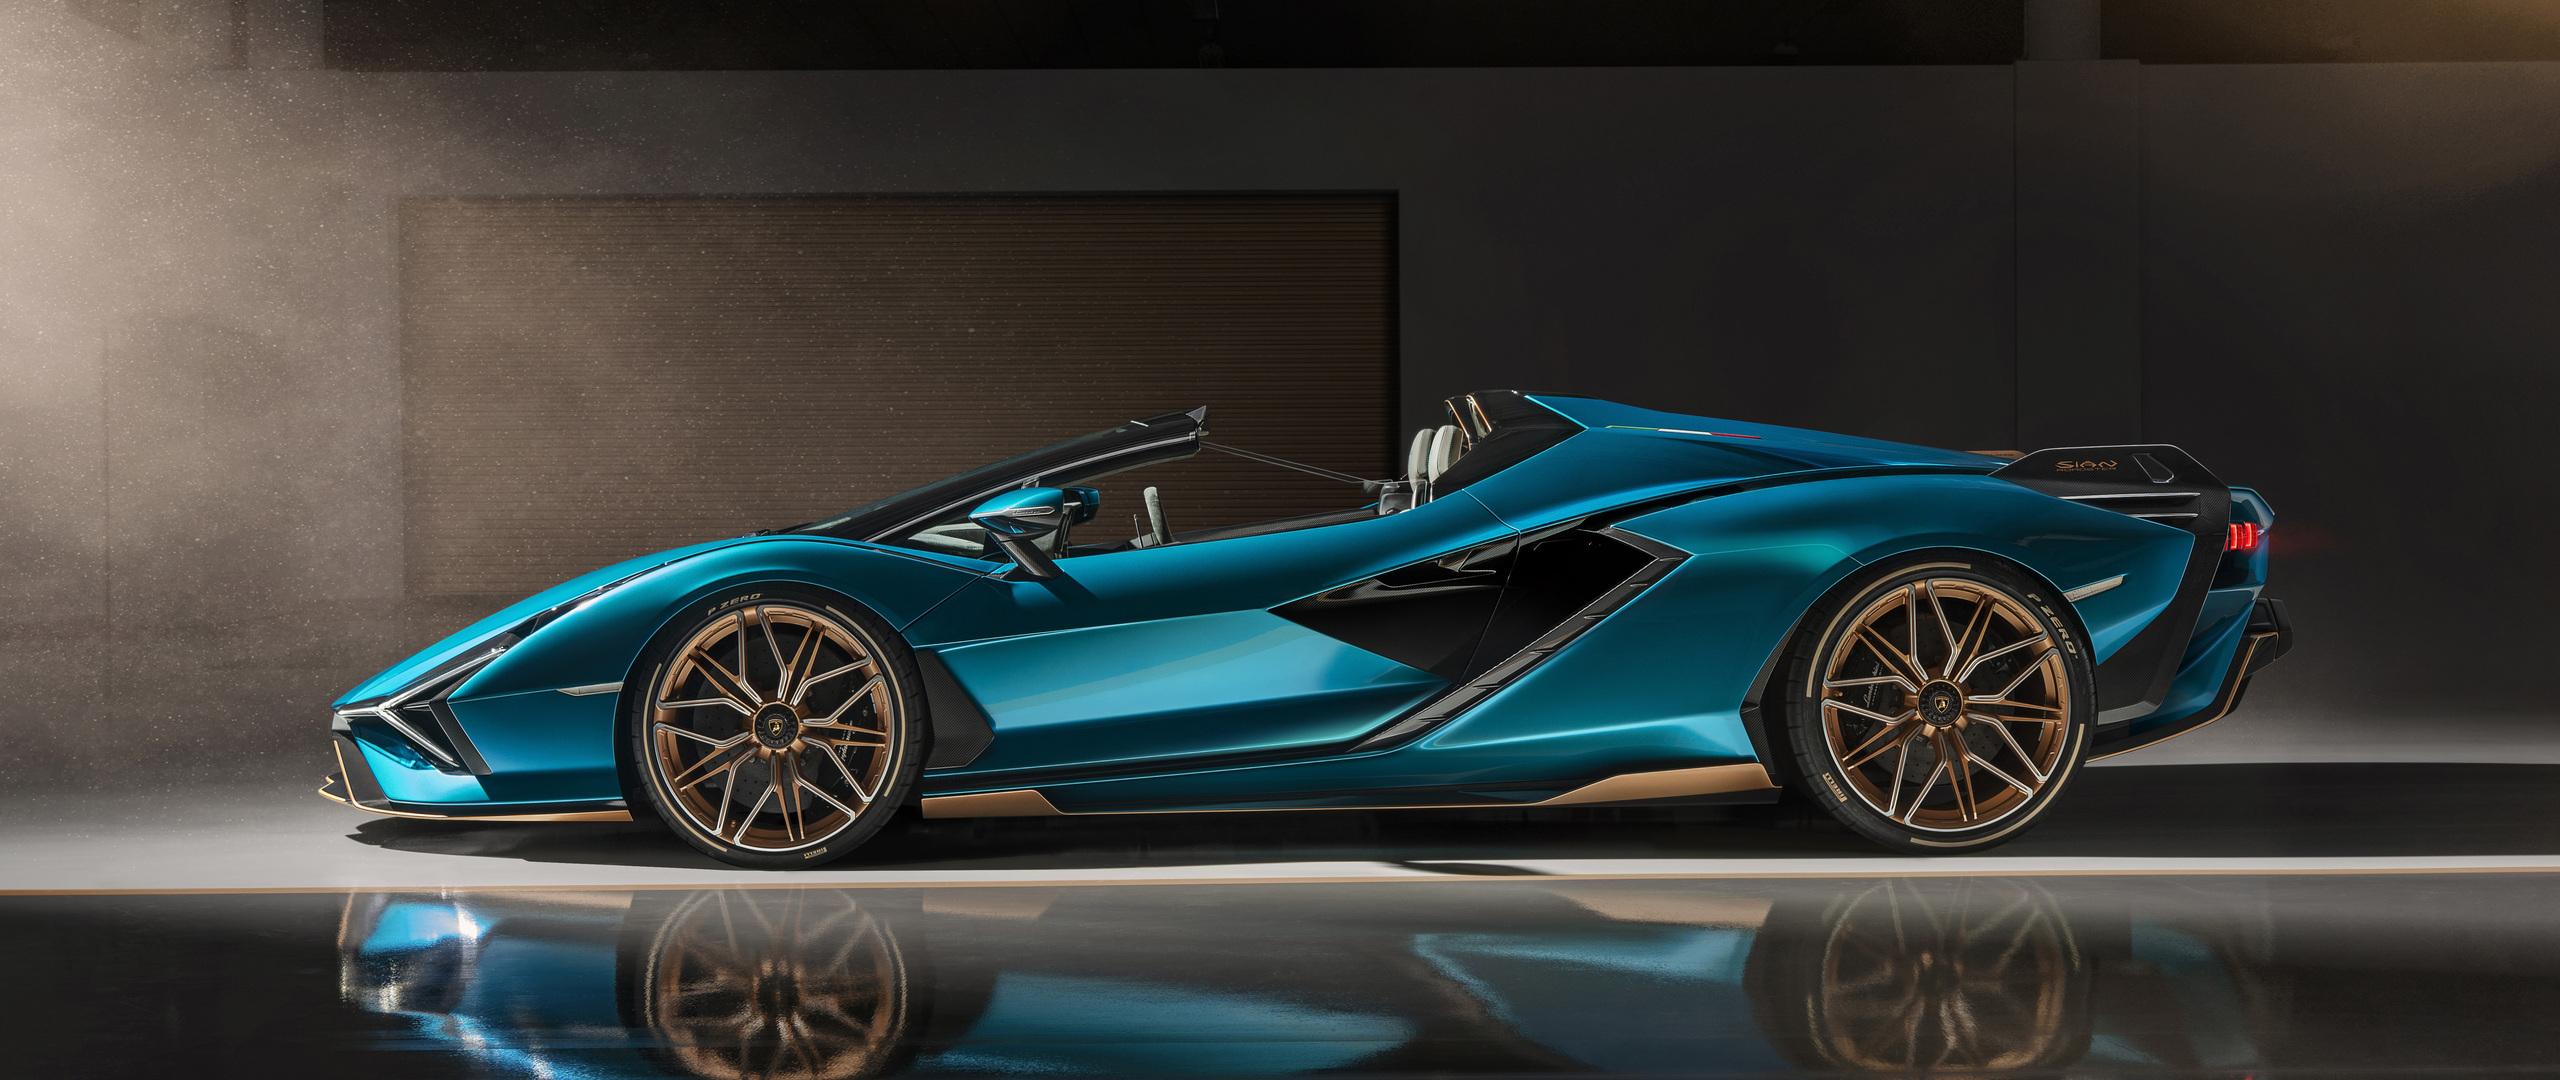 2560x1080 Lamborghini Sian Roadster 2020 Side View 8k ...